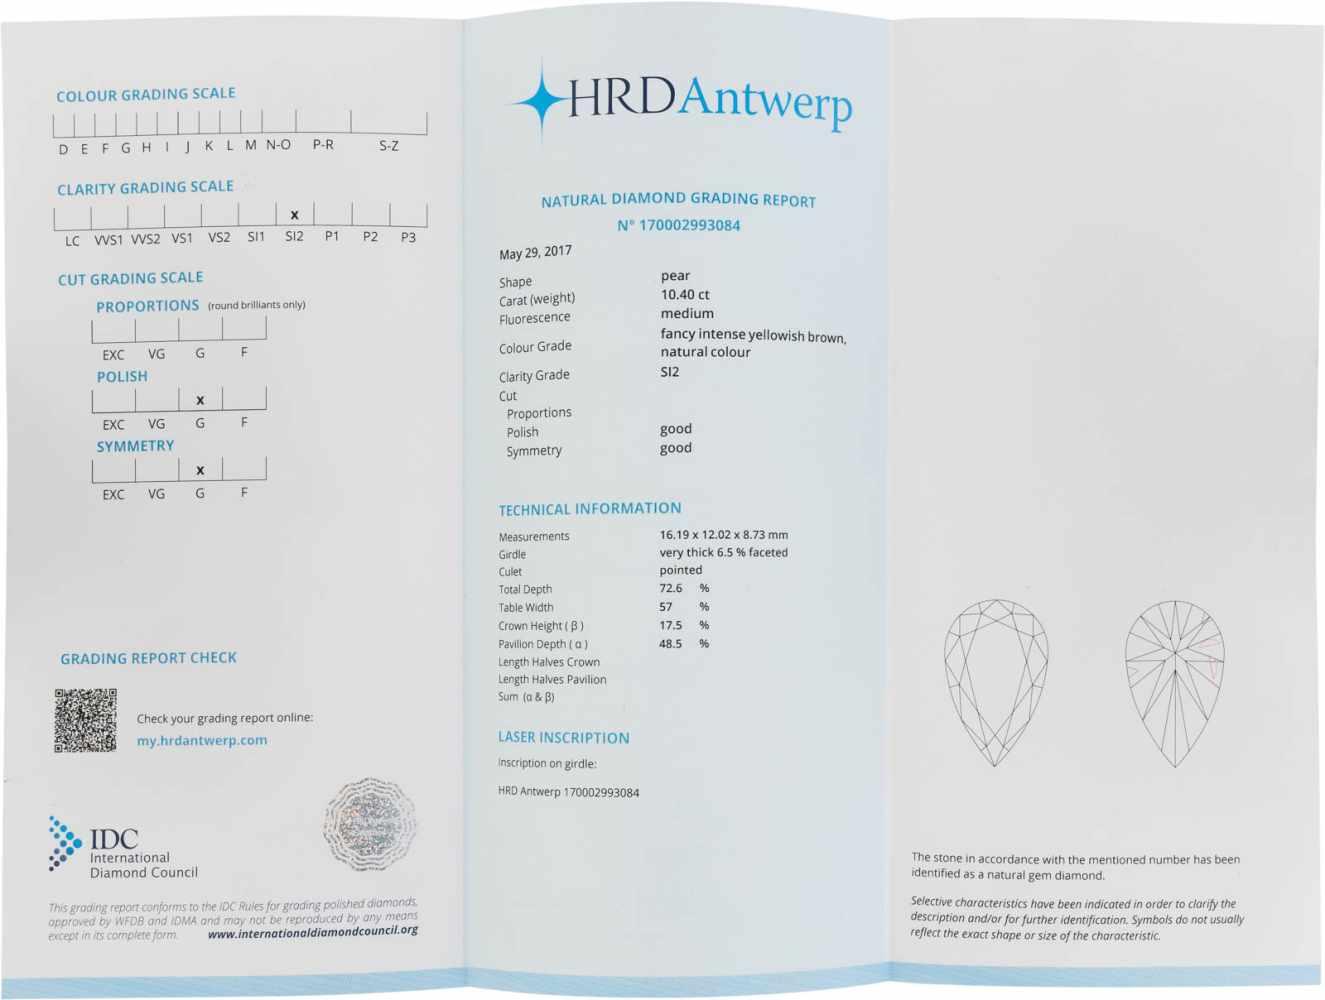 UNGEFASSTER DIAMANT - 10.40 CARAT Diamant im Tropfenschliff. 16.19 x 12.02 x 8.73 mm, 10.40 ct.. - Image 4 of 4